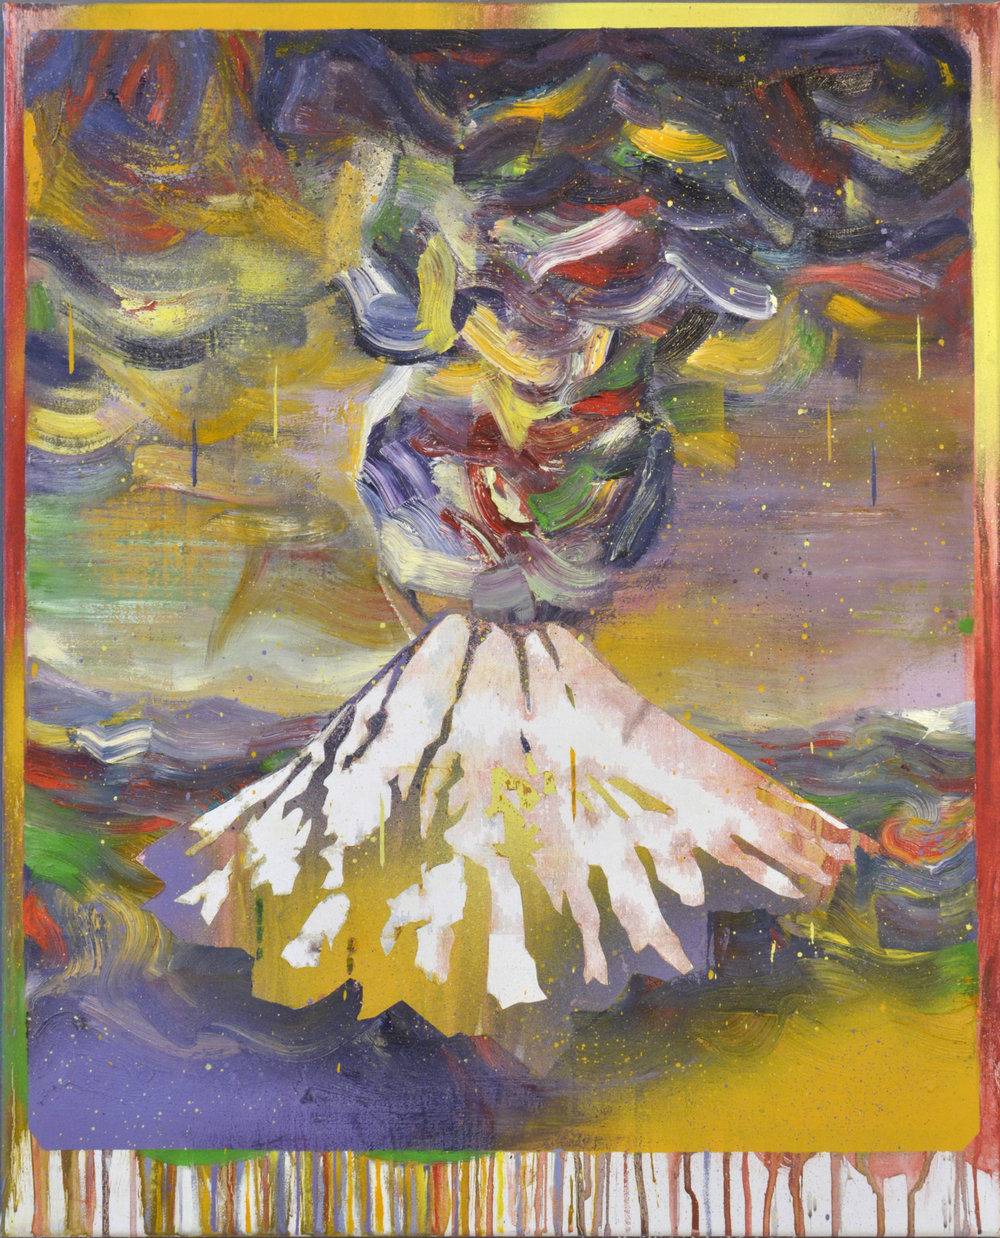 Sumbawa  oil on canvas 70 x 60 cm, 2018